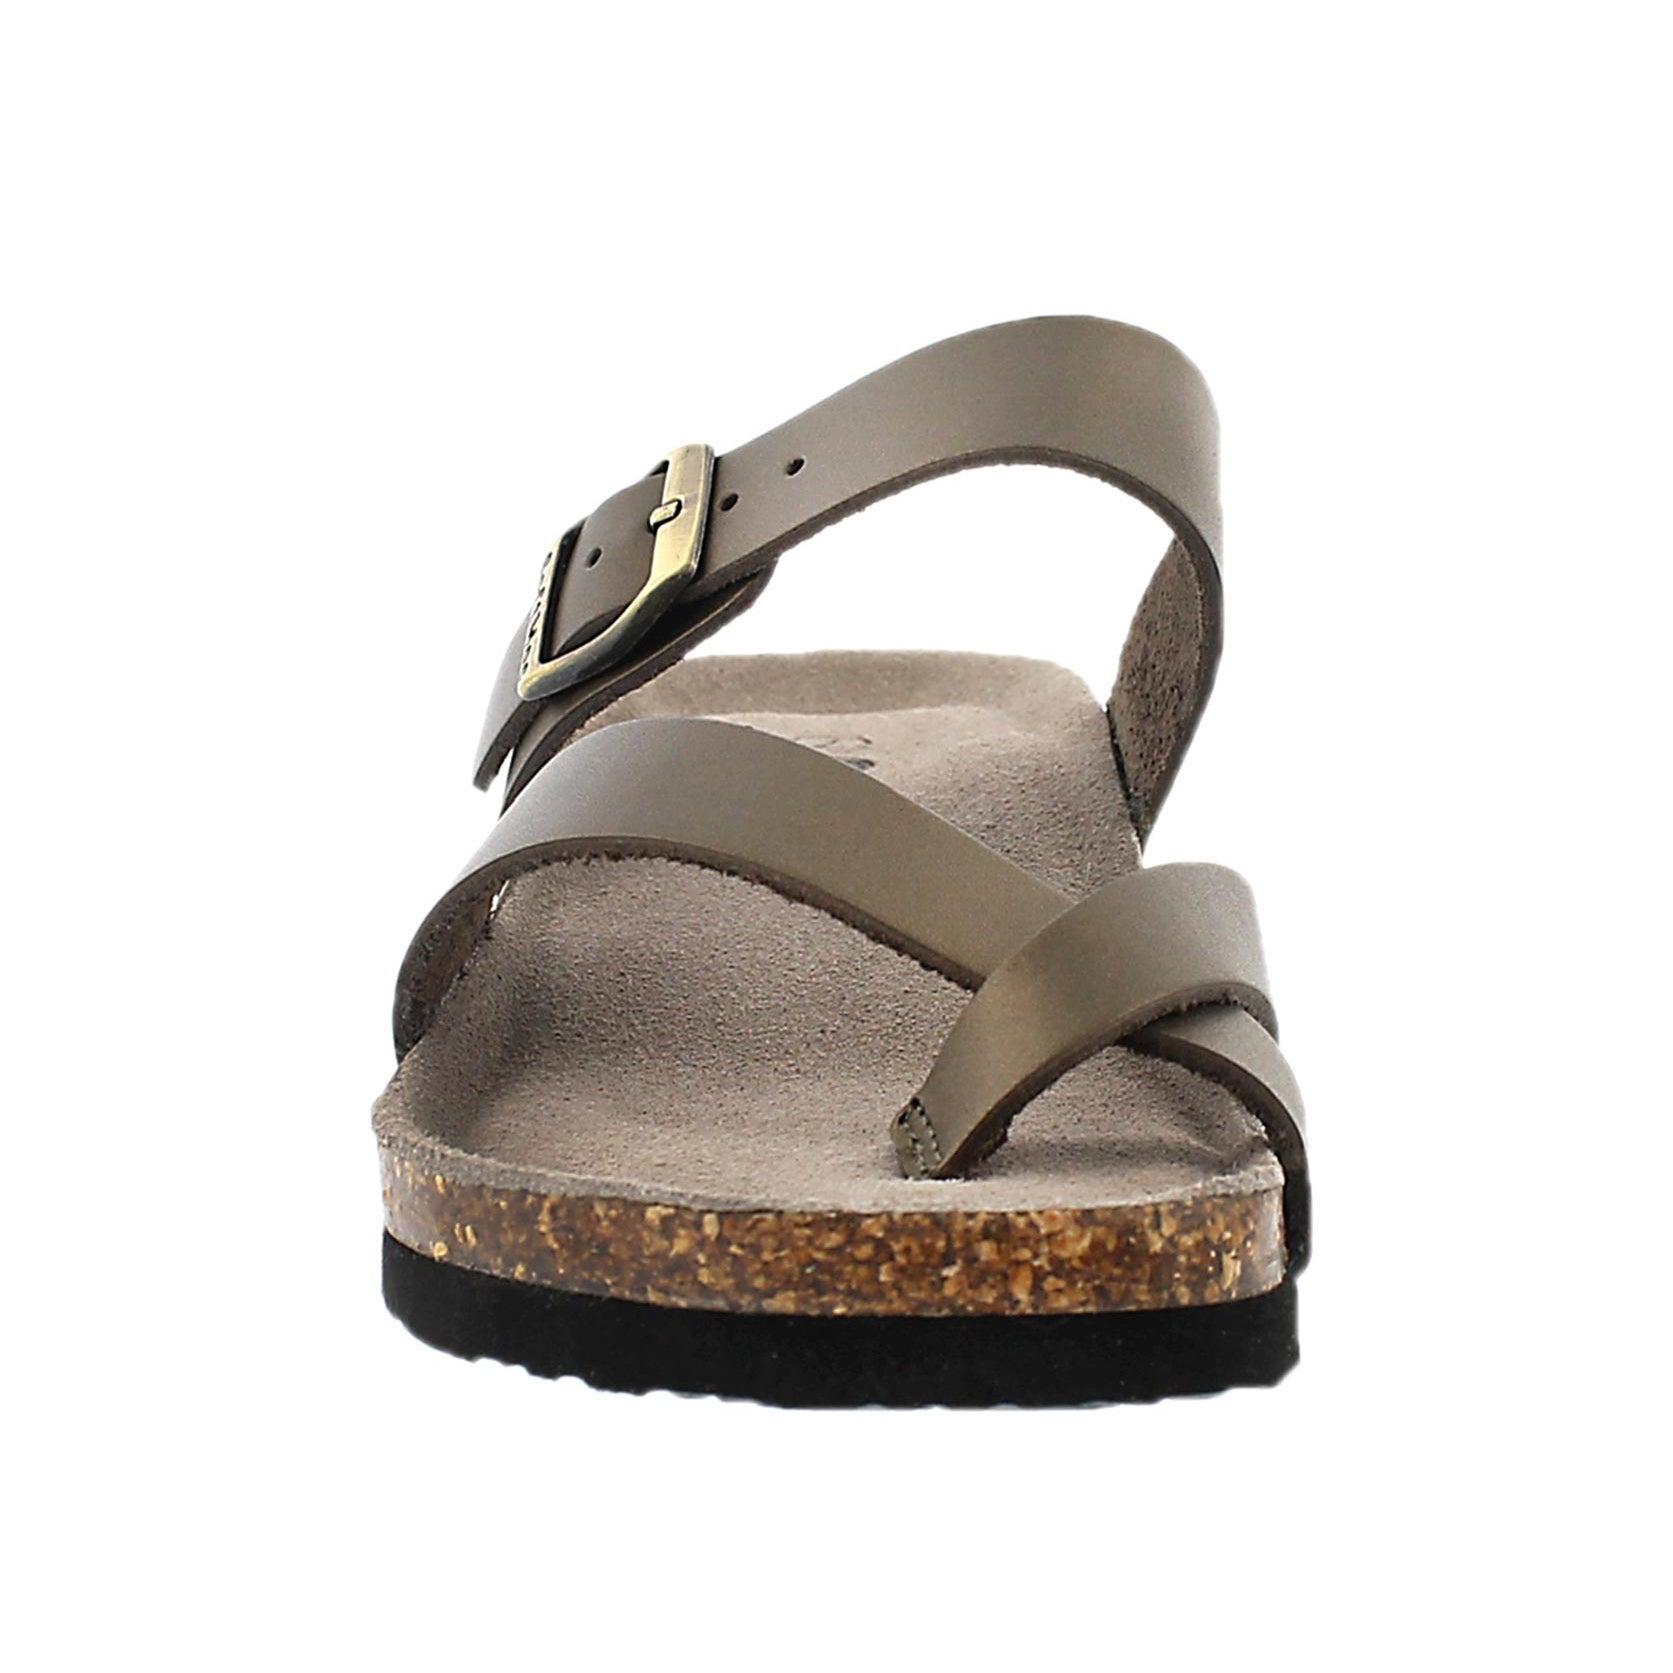 Lds Gemma rose gld mem. foam wdge sandal